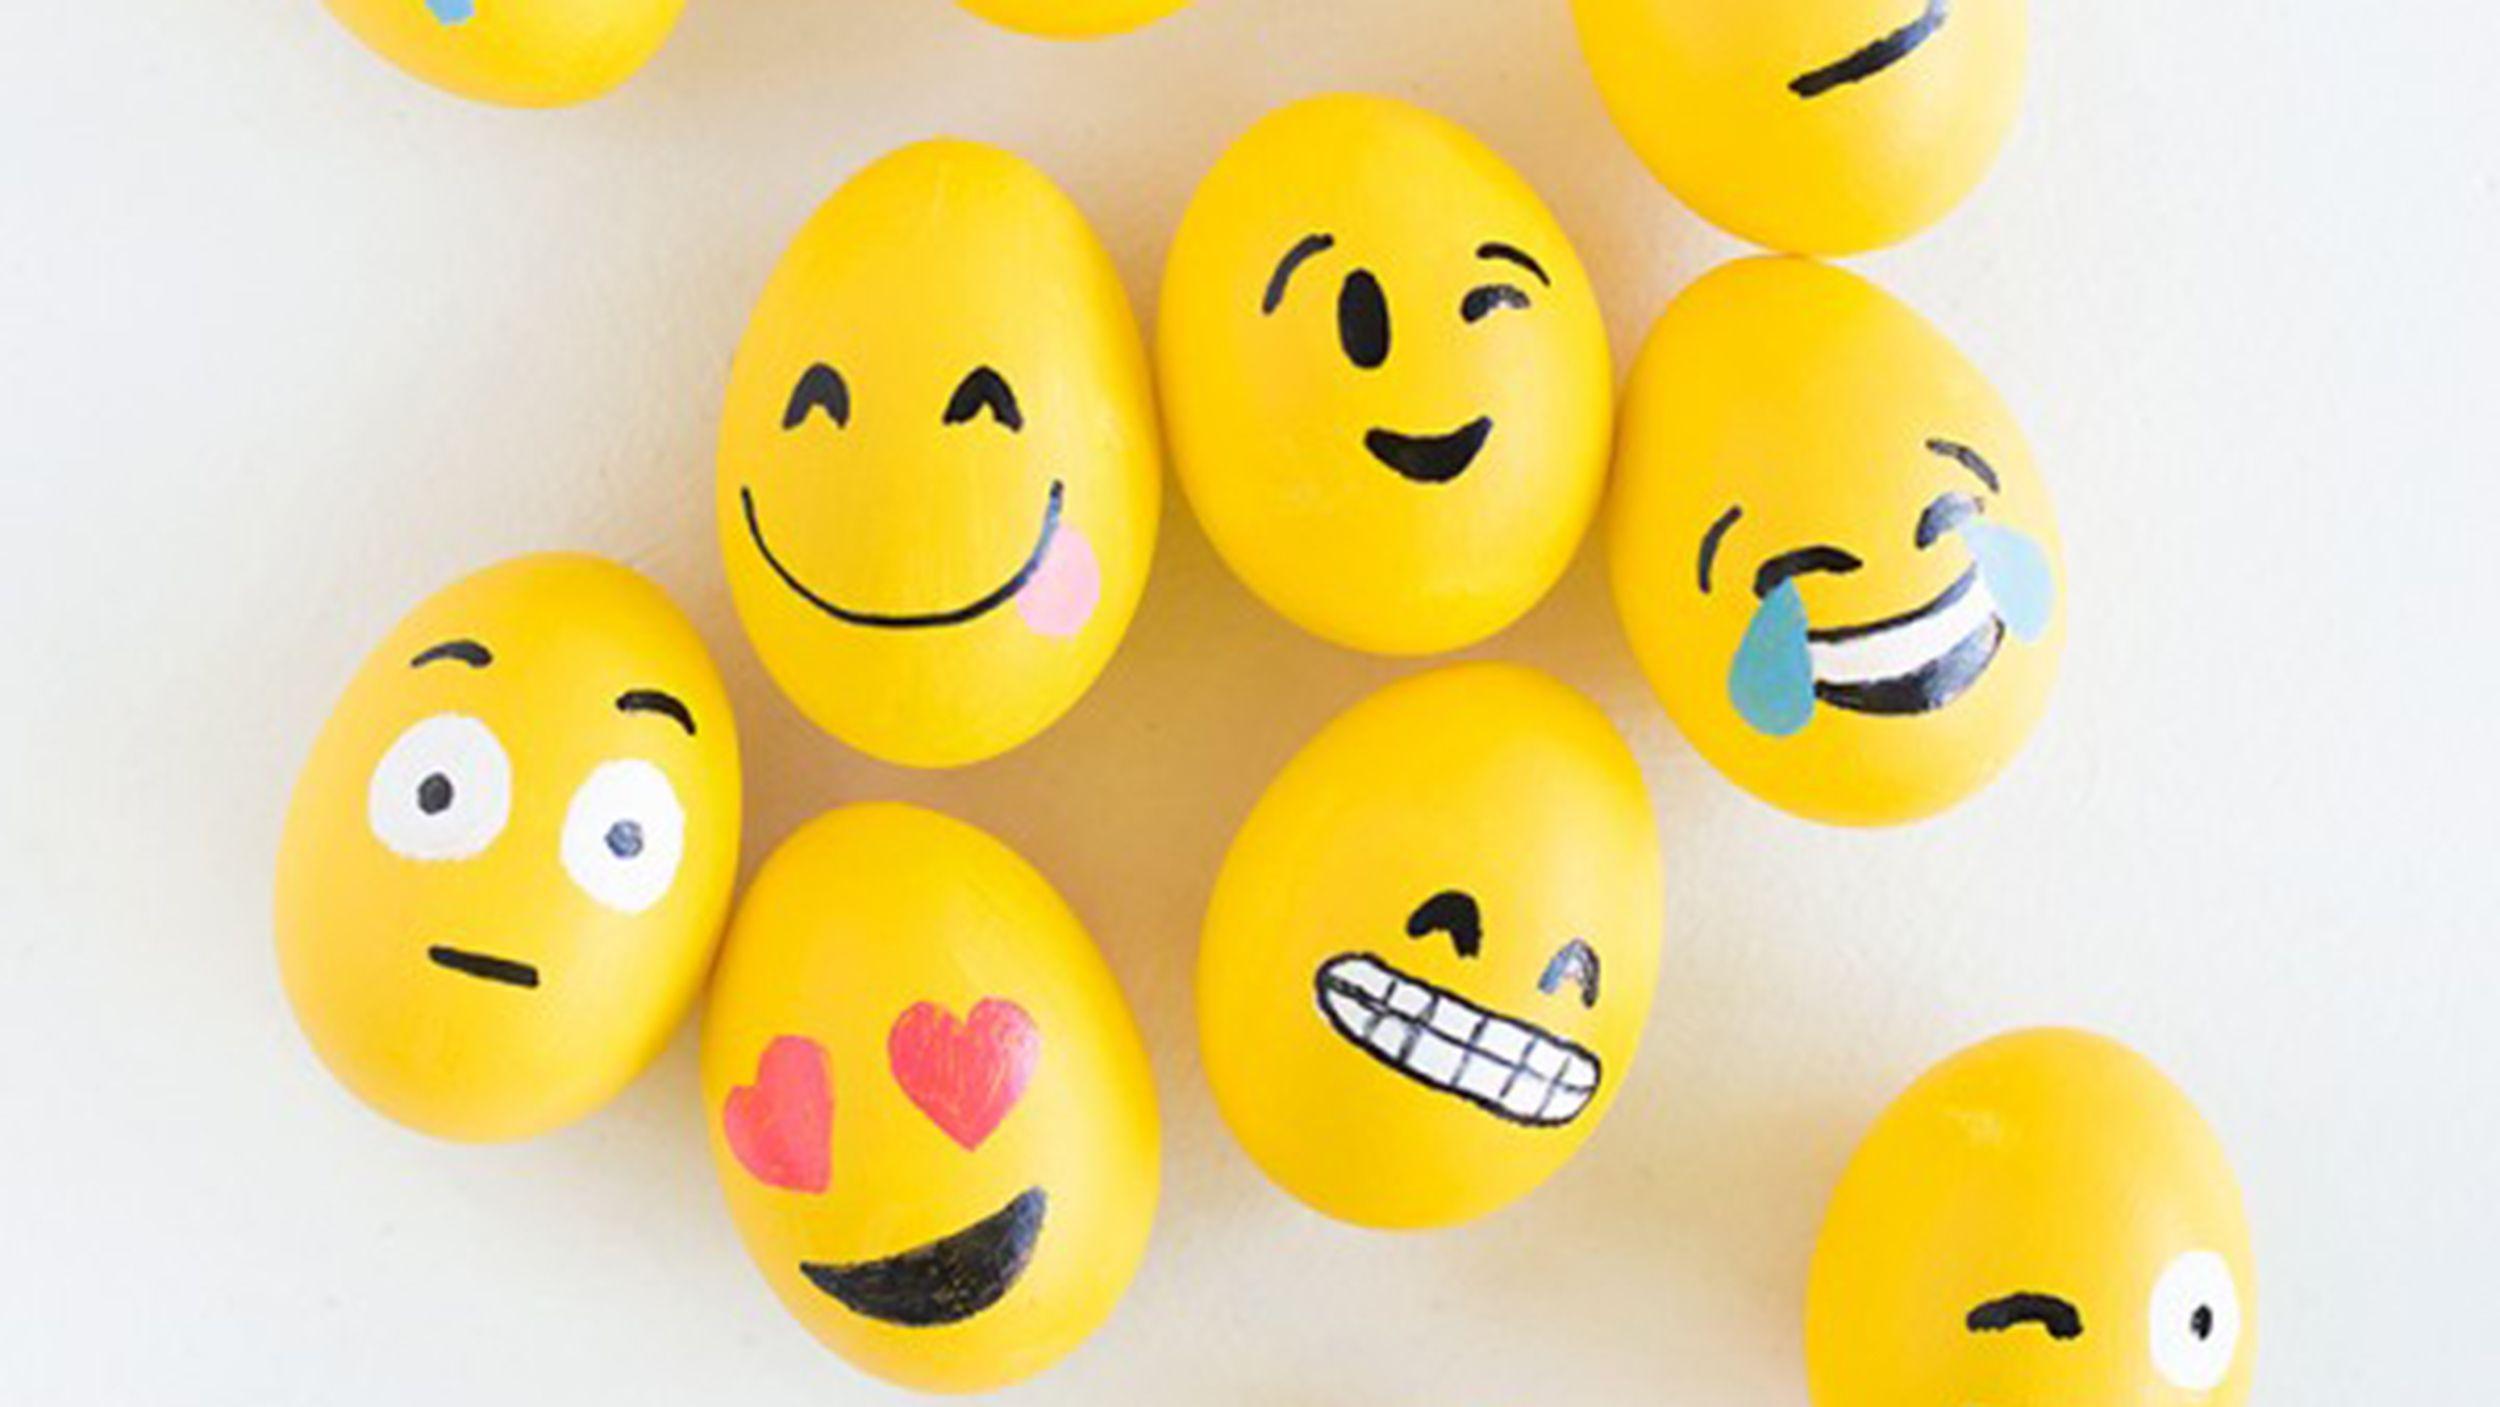 Emoji Easter eggs! Make this Pinterest-worthy DIY